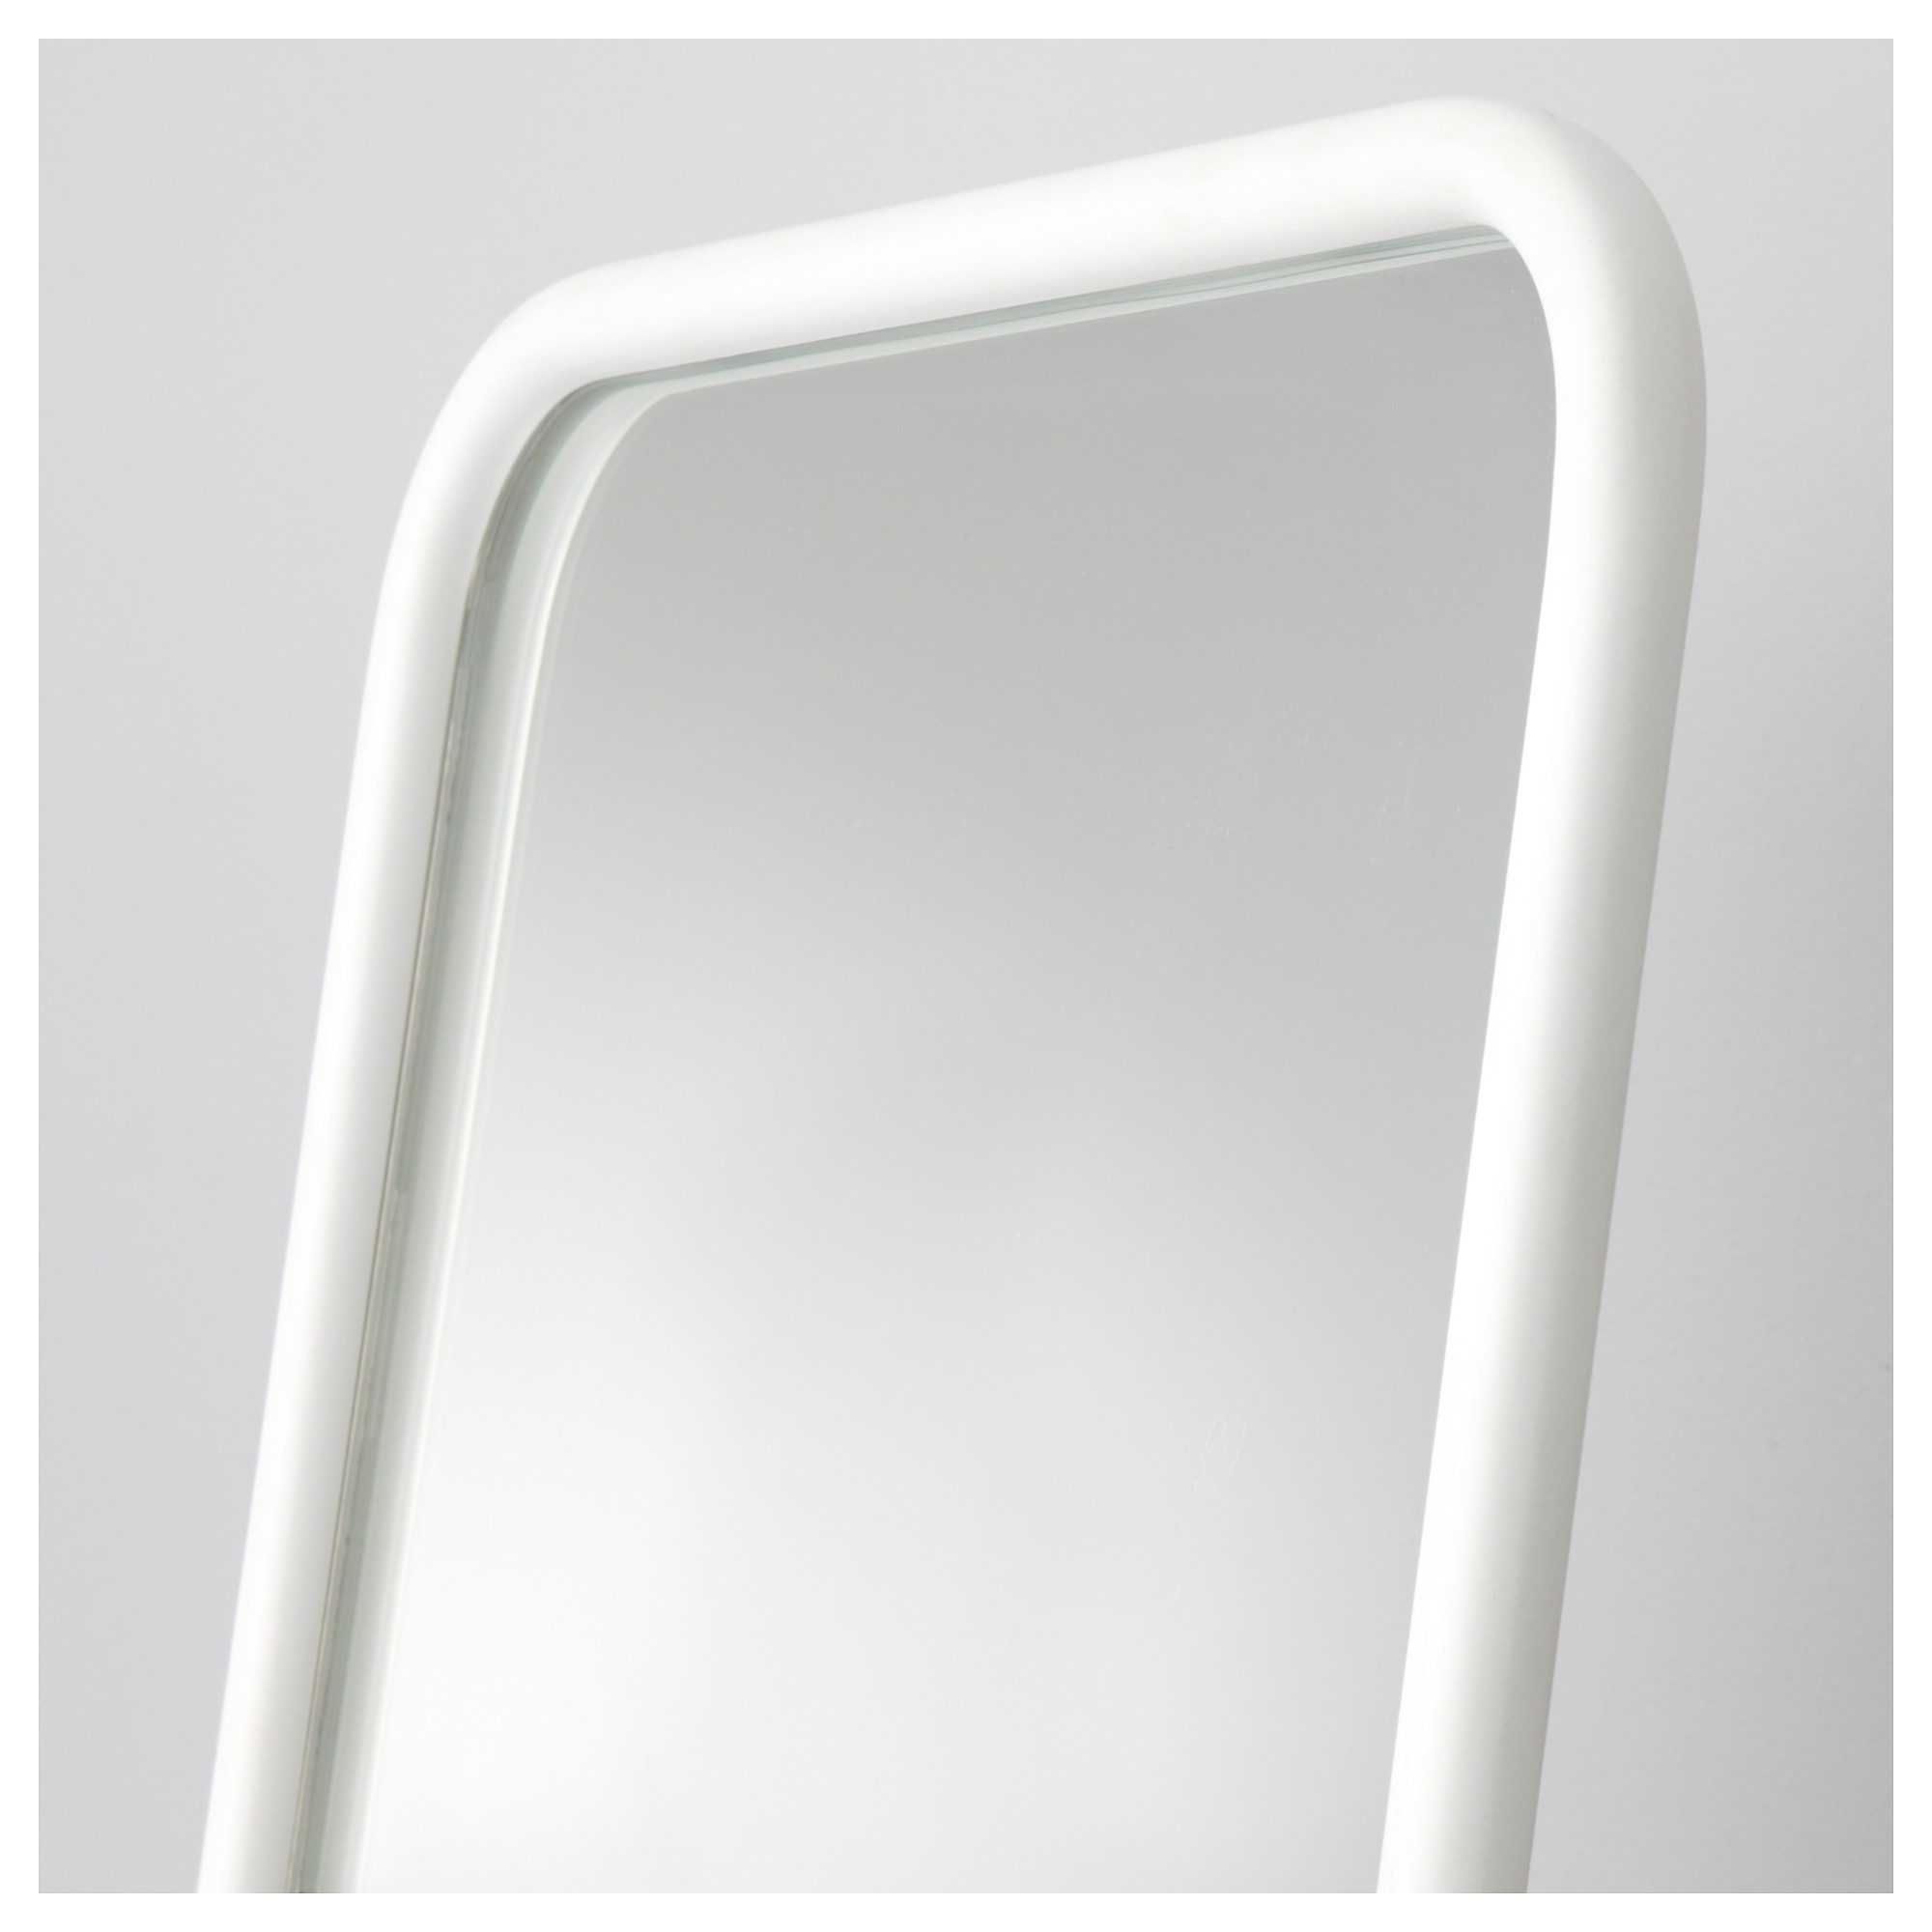 Knapper Standing Mirror White Ikea Hong Kong And Macau